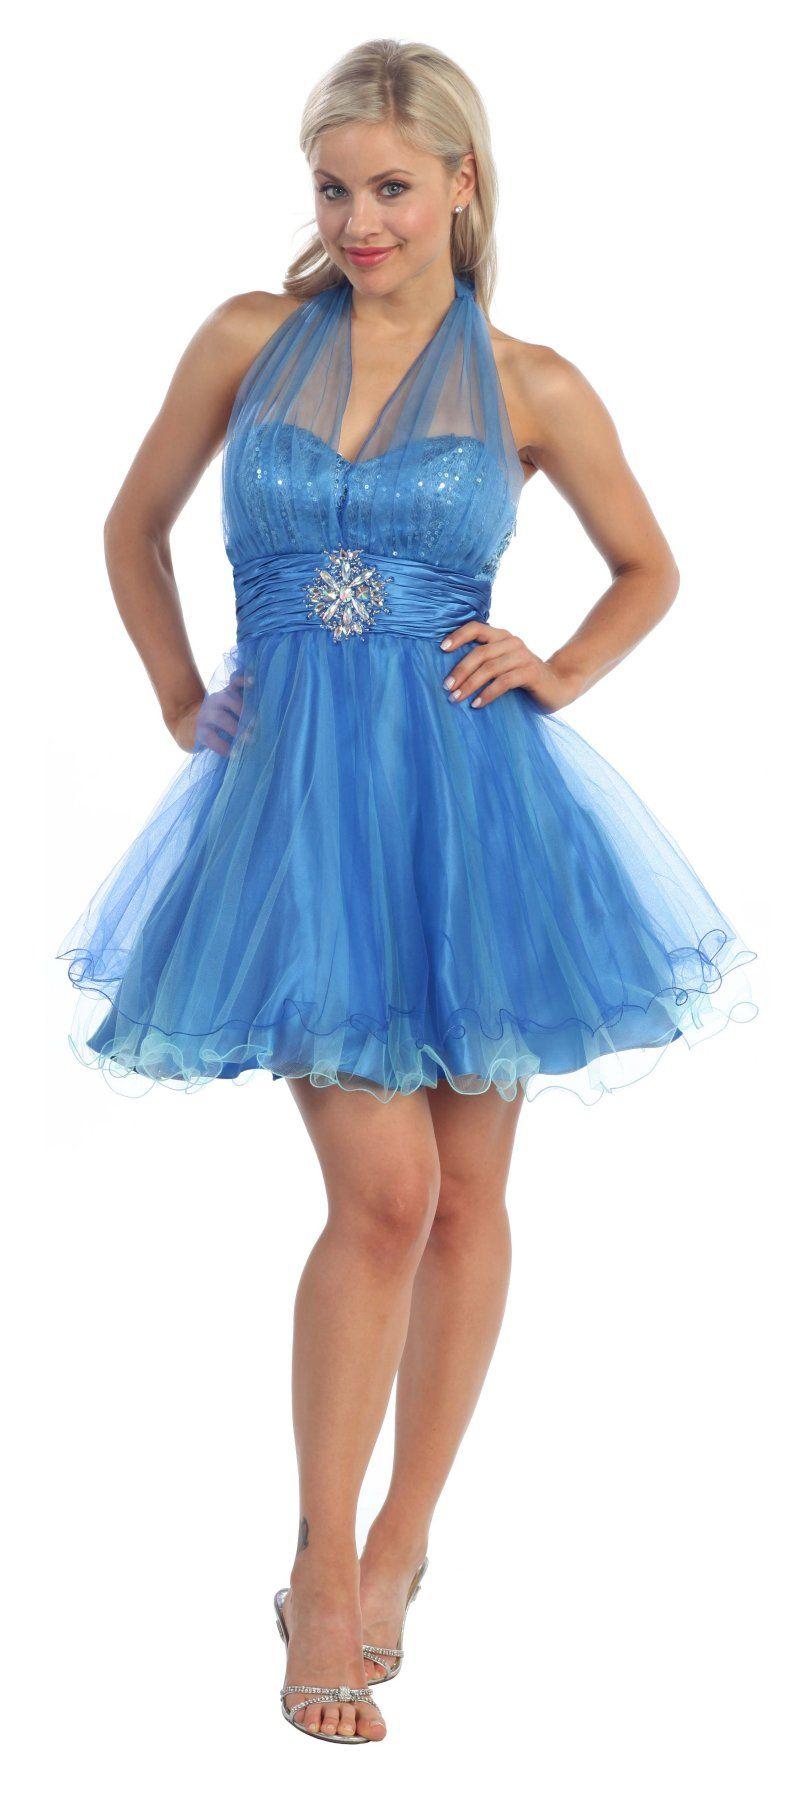 Short Blue Prom Dress Halter Top Sequin Bodice Poofy Skirt Tulle ...